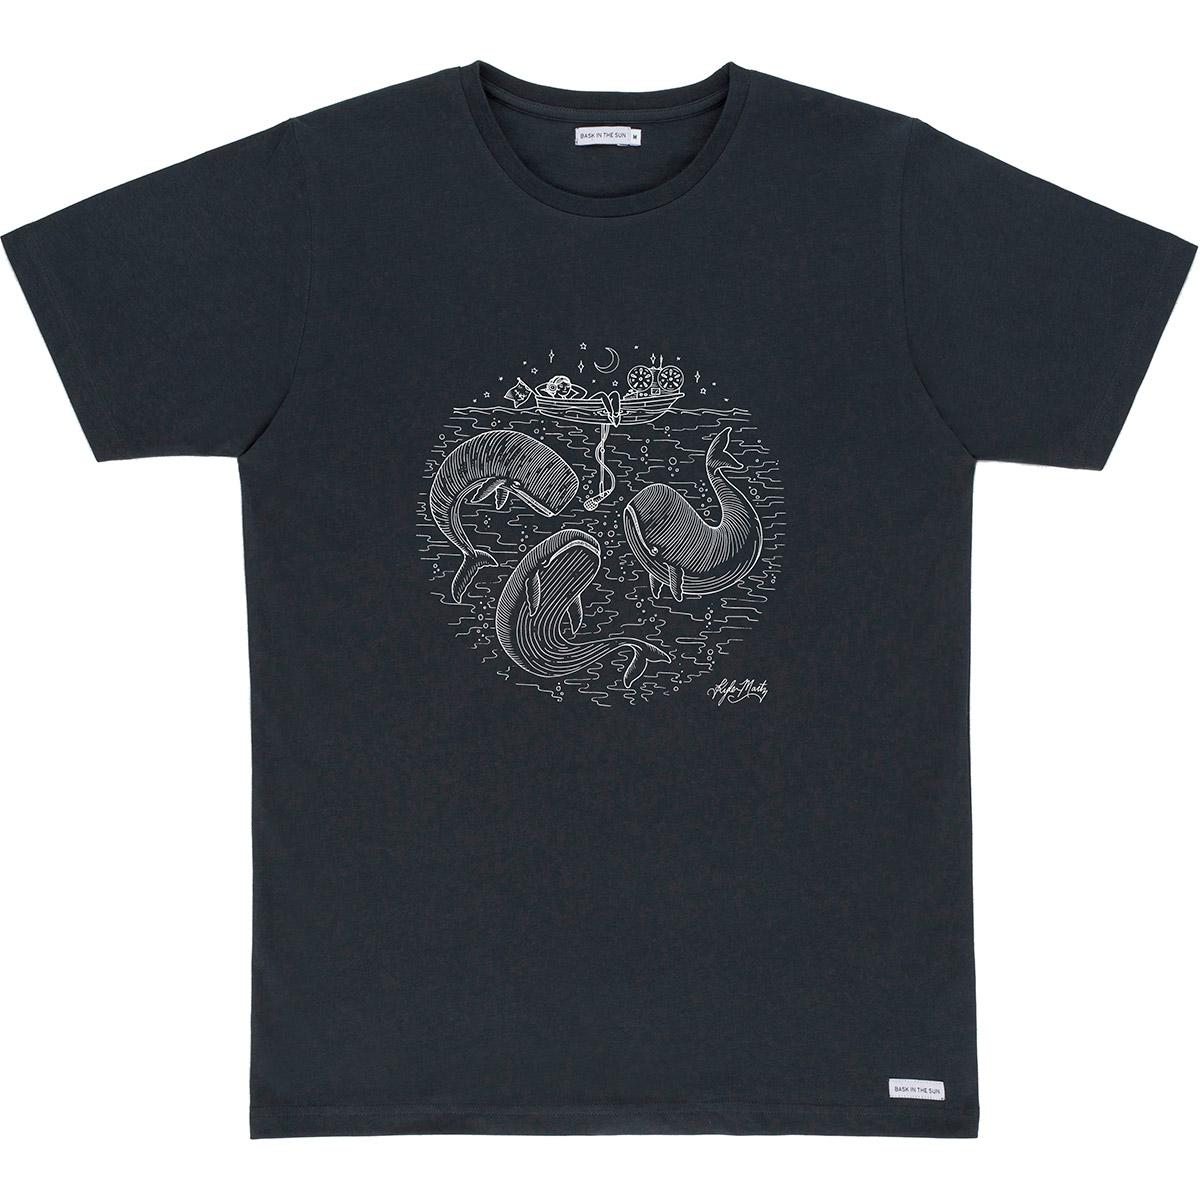 T-shirt en coton bio black radio cetace - Bask in the Sun num 0